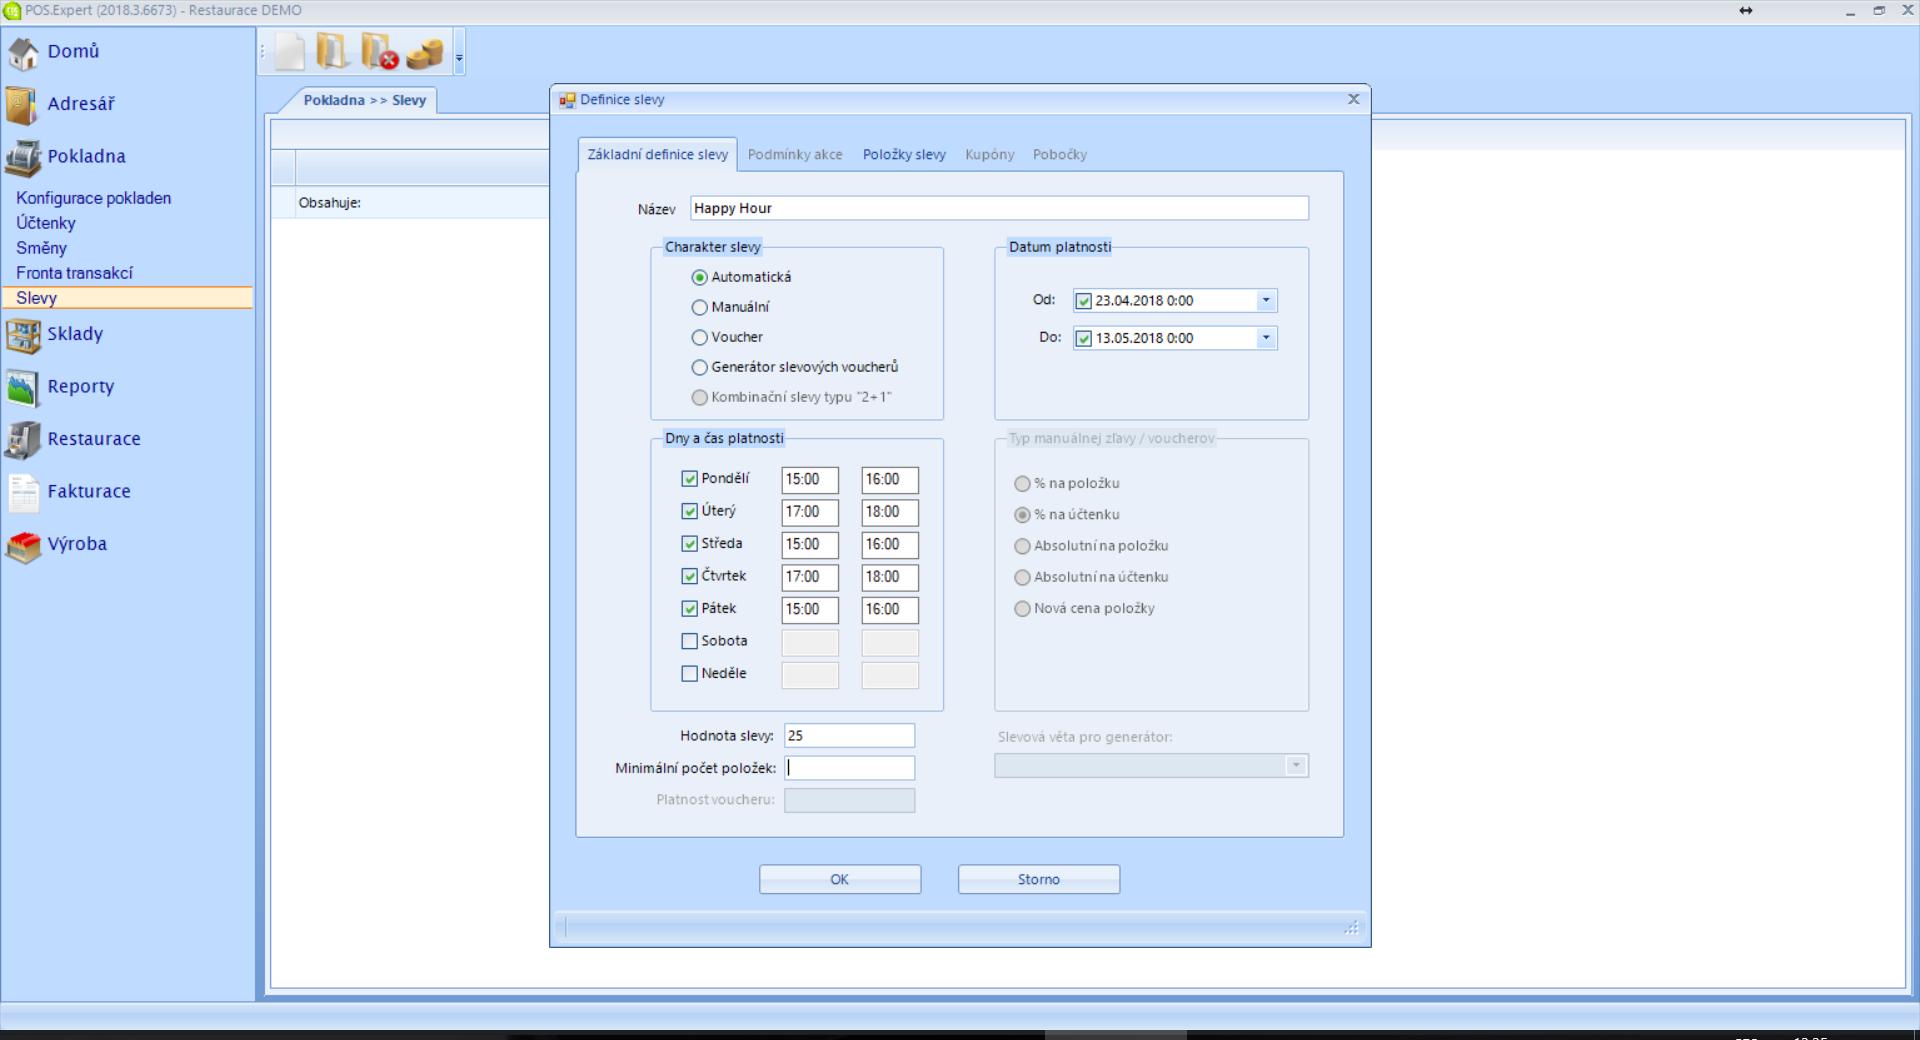 screenshot POS Expert slevový systém